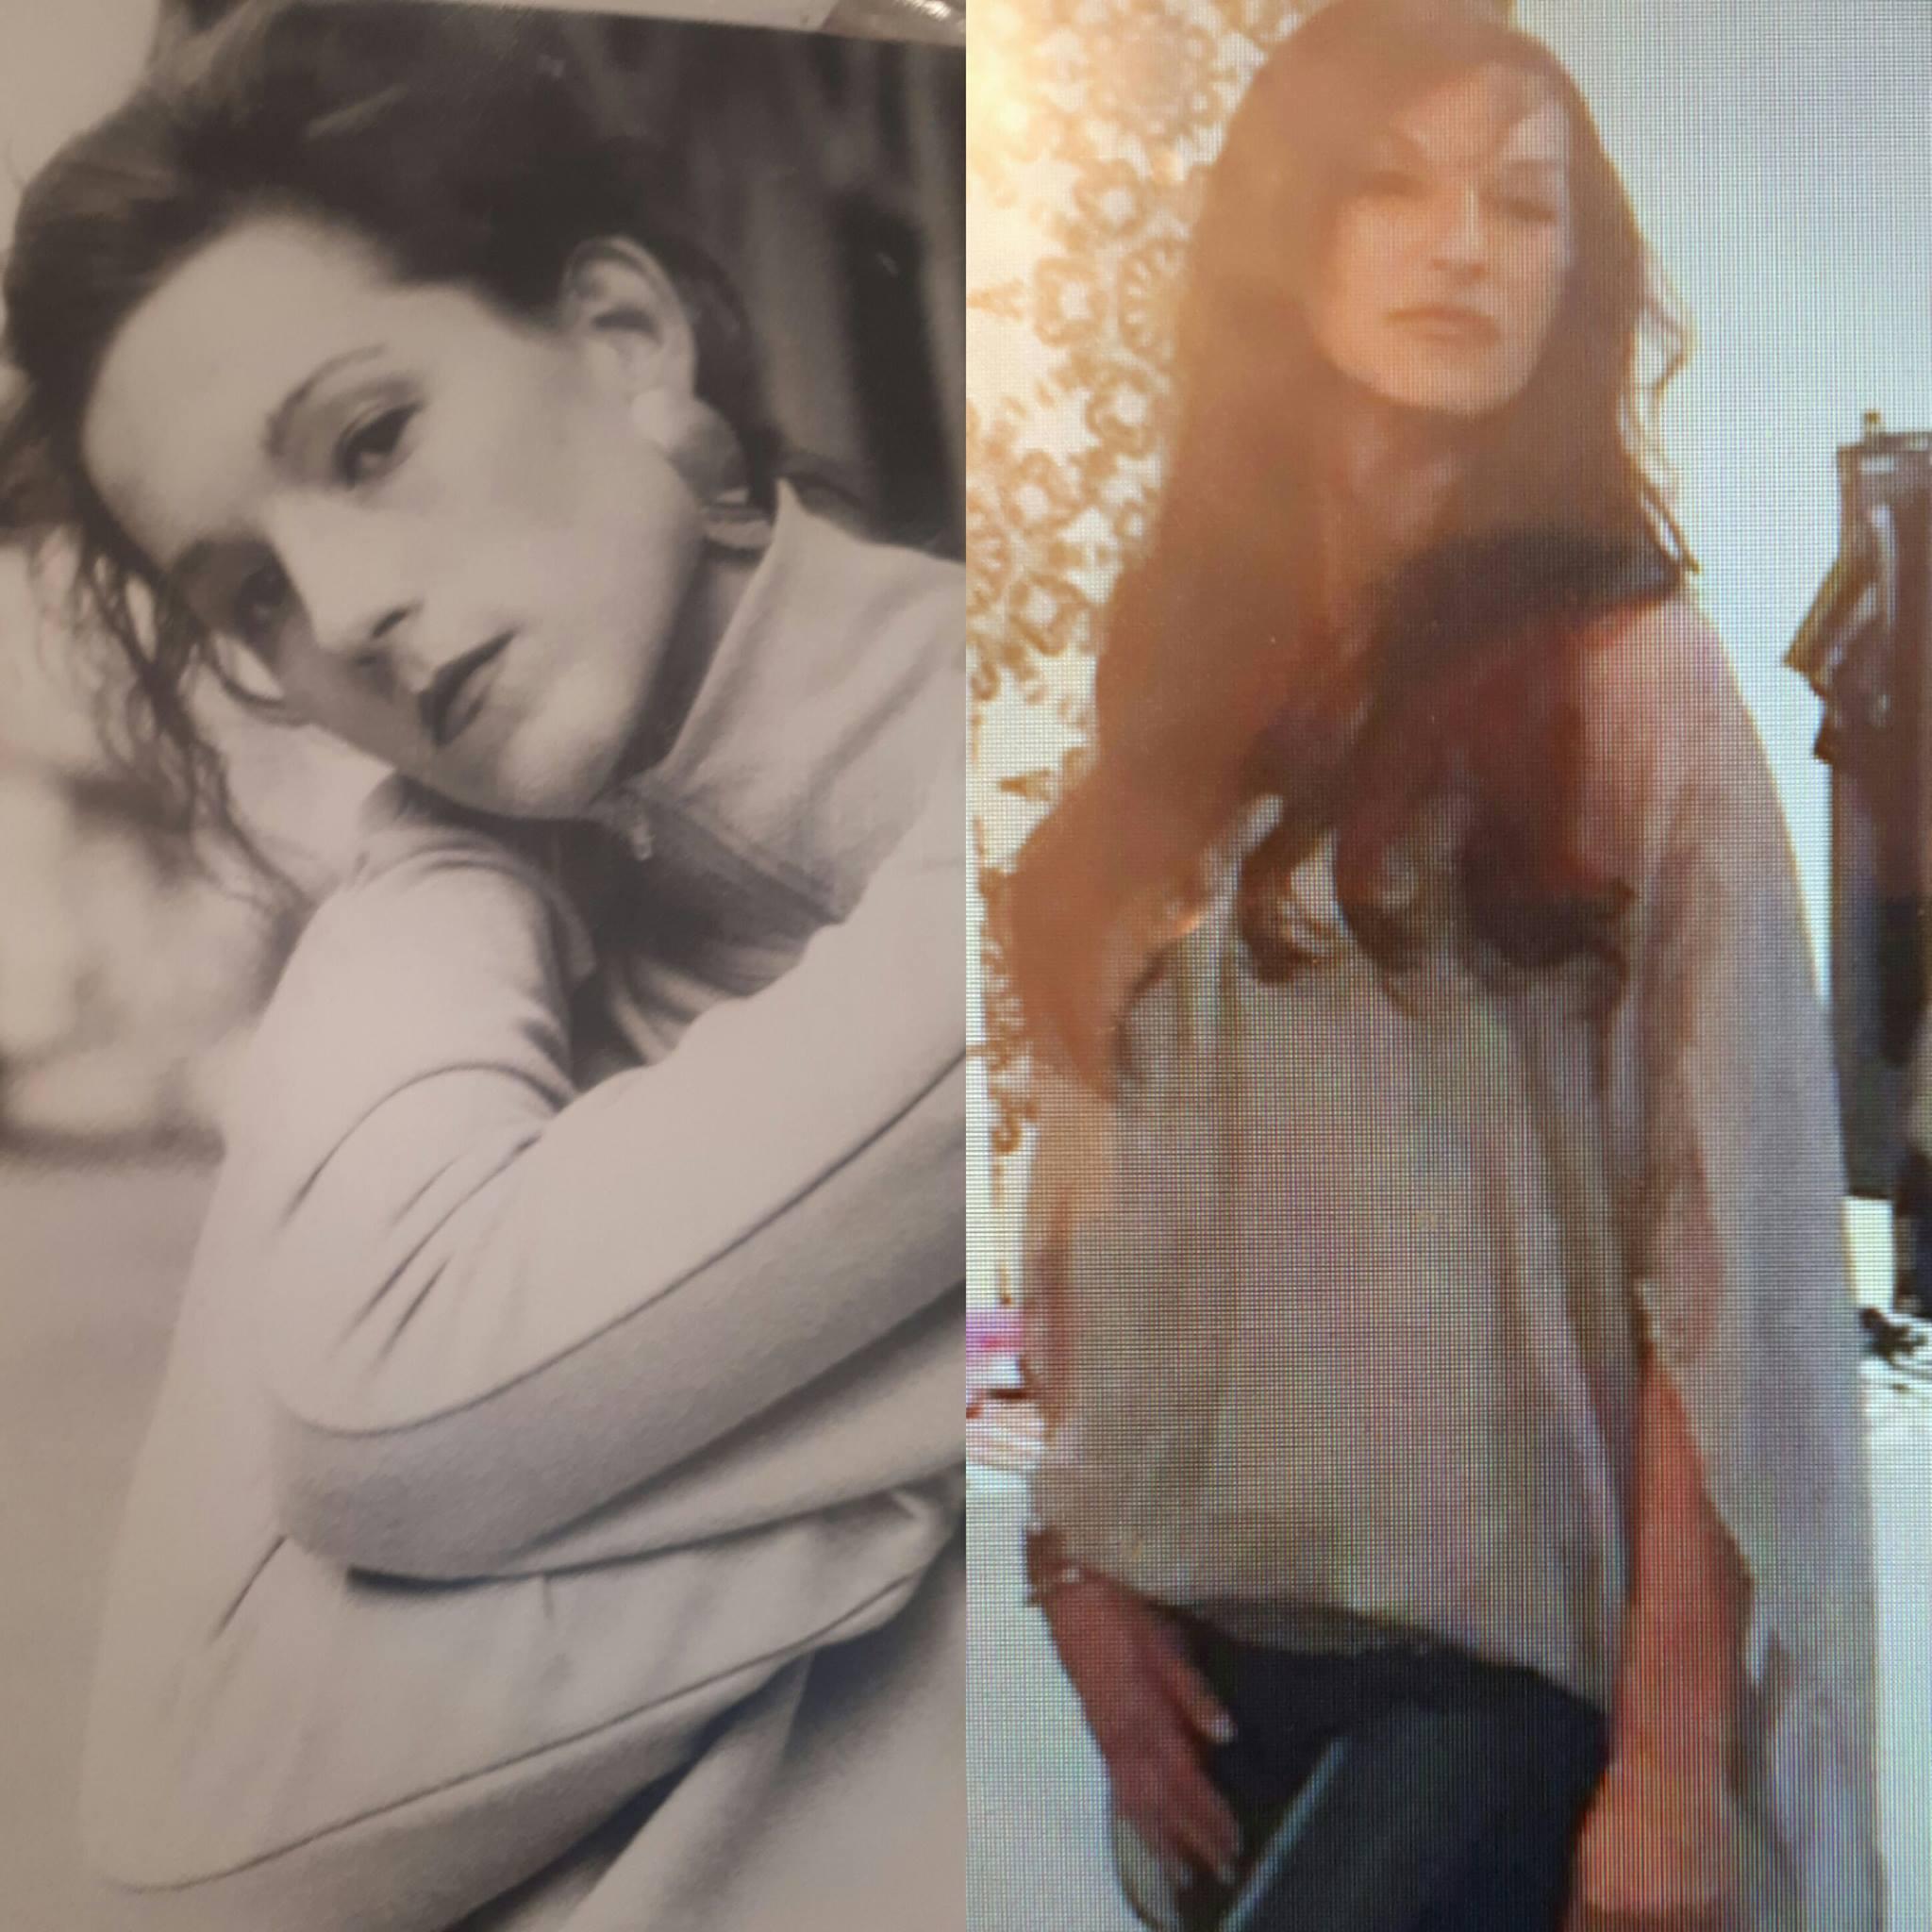 Fashionista Doris Ainedter